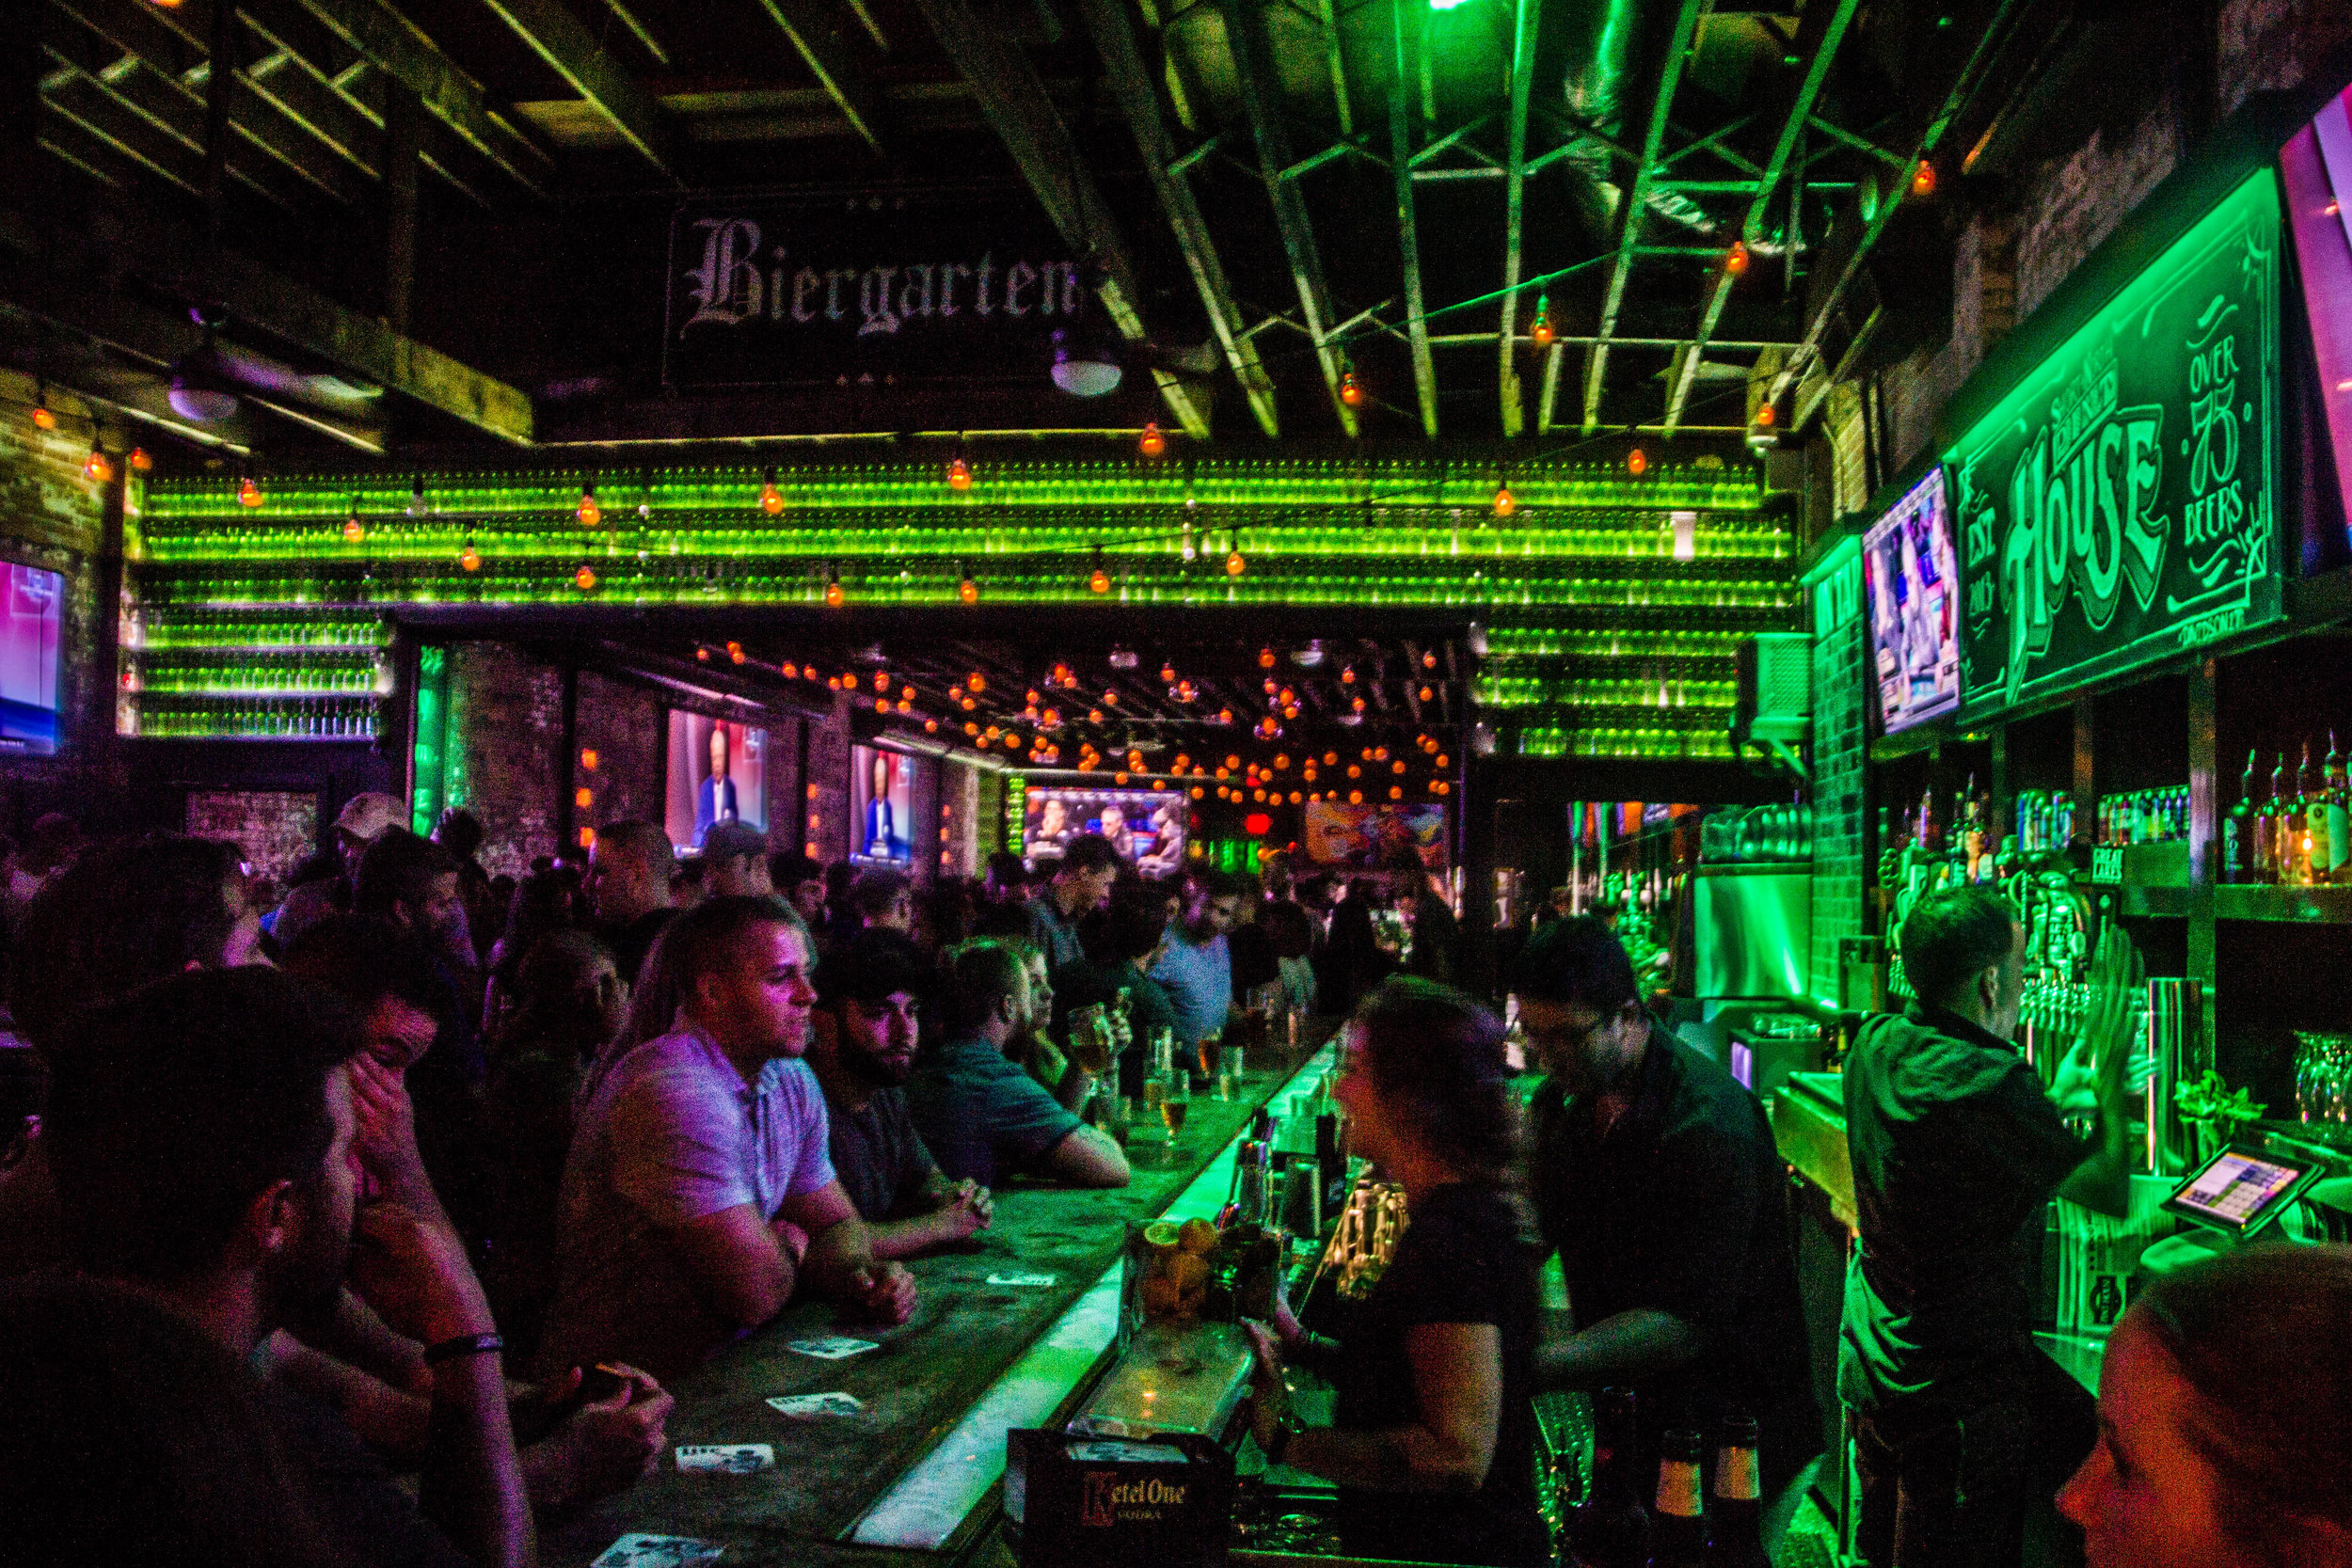 pint-house-columbus-ohio-bars-3.jpg